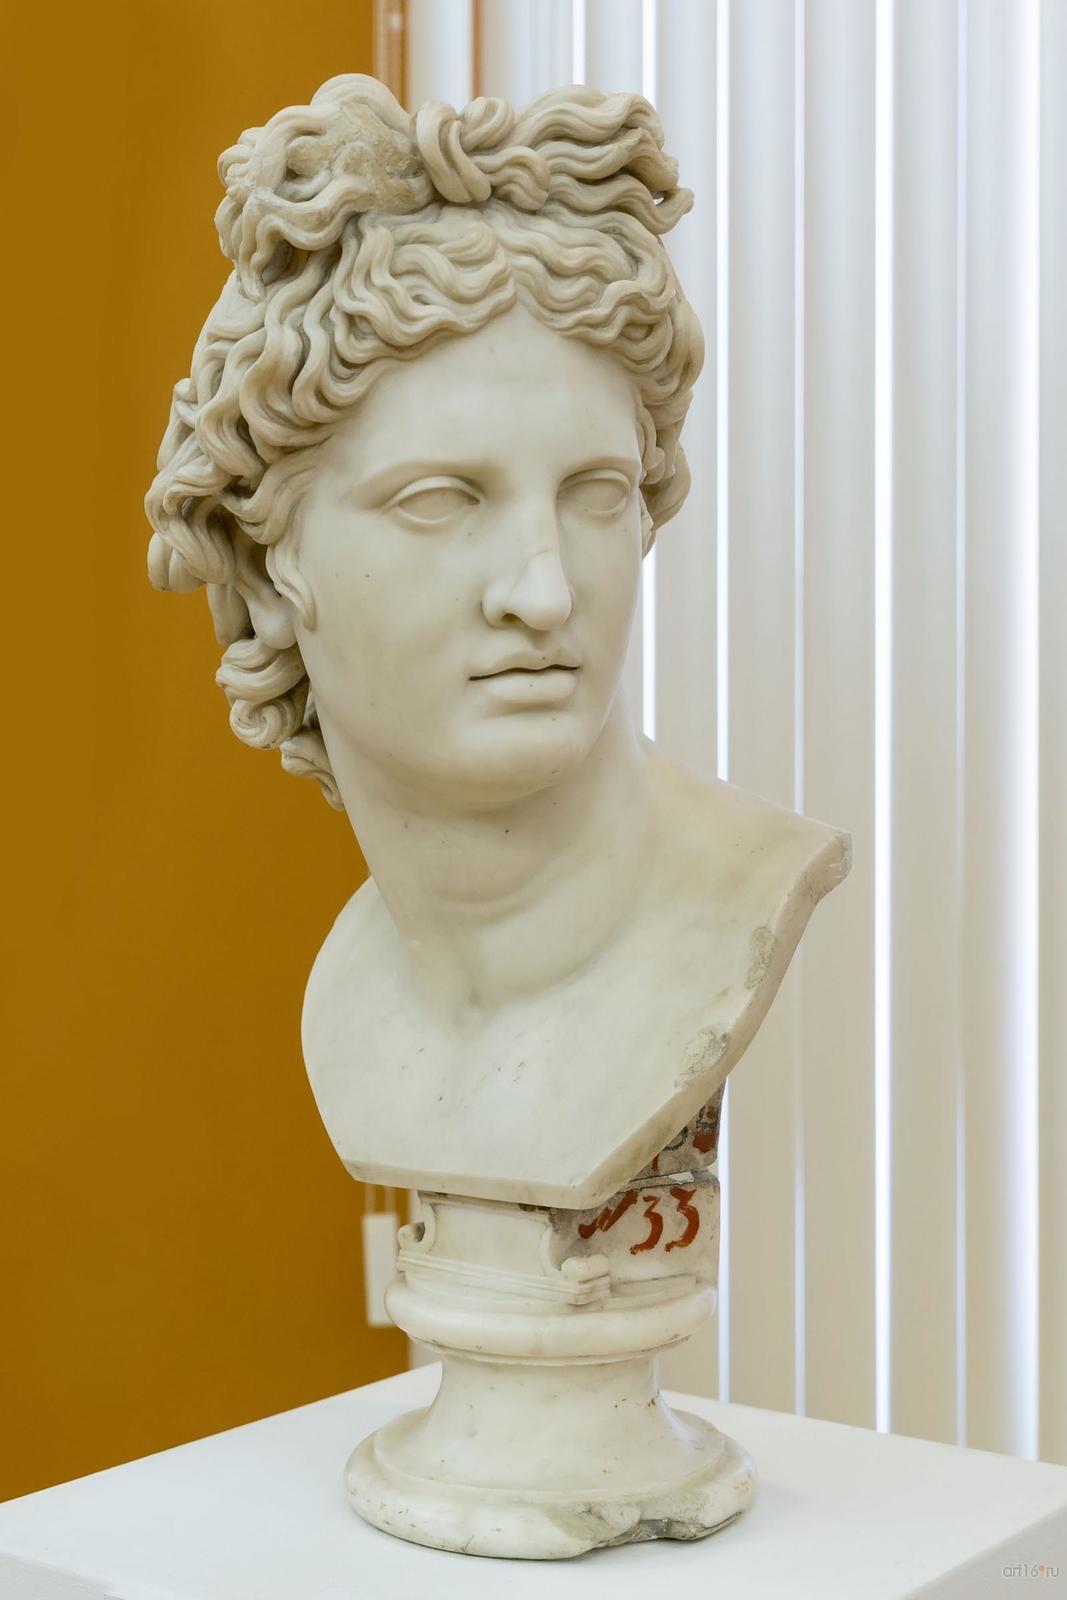 Фото №848329. КАРЛО АЛЬБАЧИНИ 1734. Рим — 1813. Рим. Аполлон Бельведерский. Мрамор